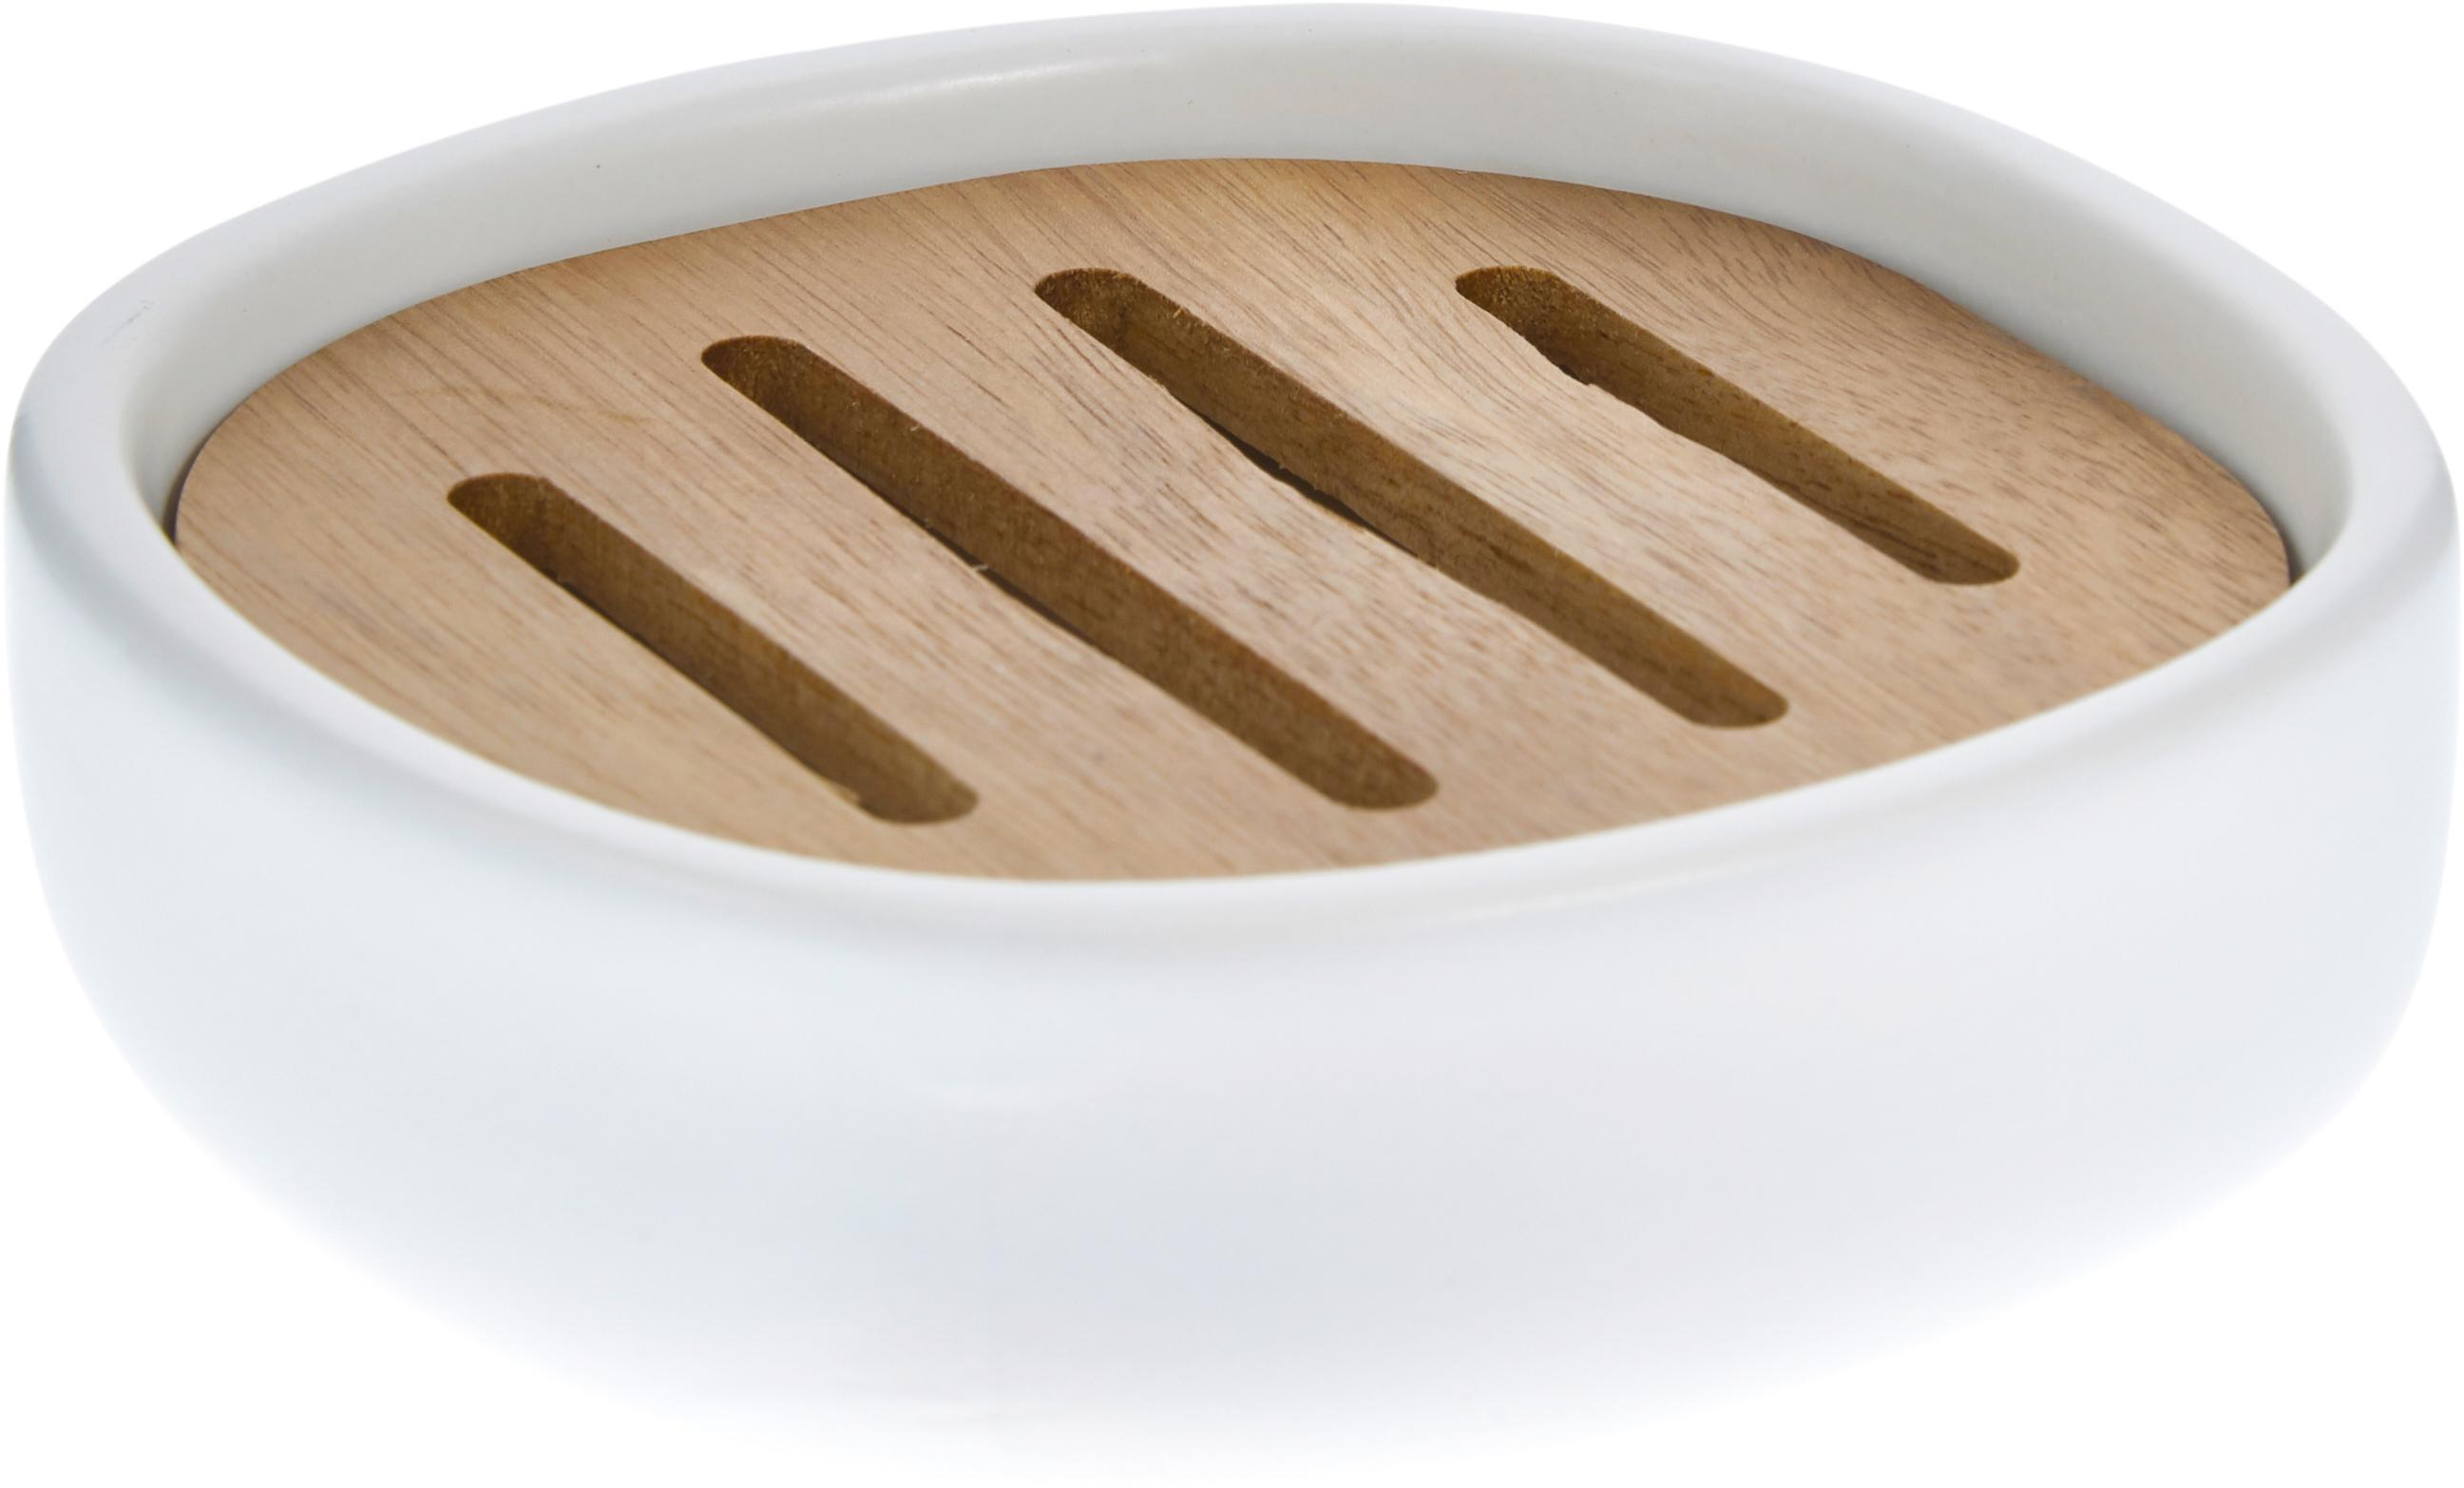 Keramik-Seifenschale Wili mit Akazienholz-Einsatz, Weiß, Akazienholz, Ø 13 x H 4 cm